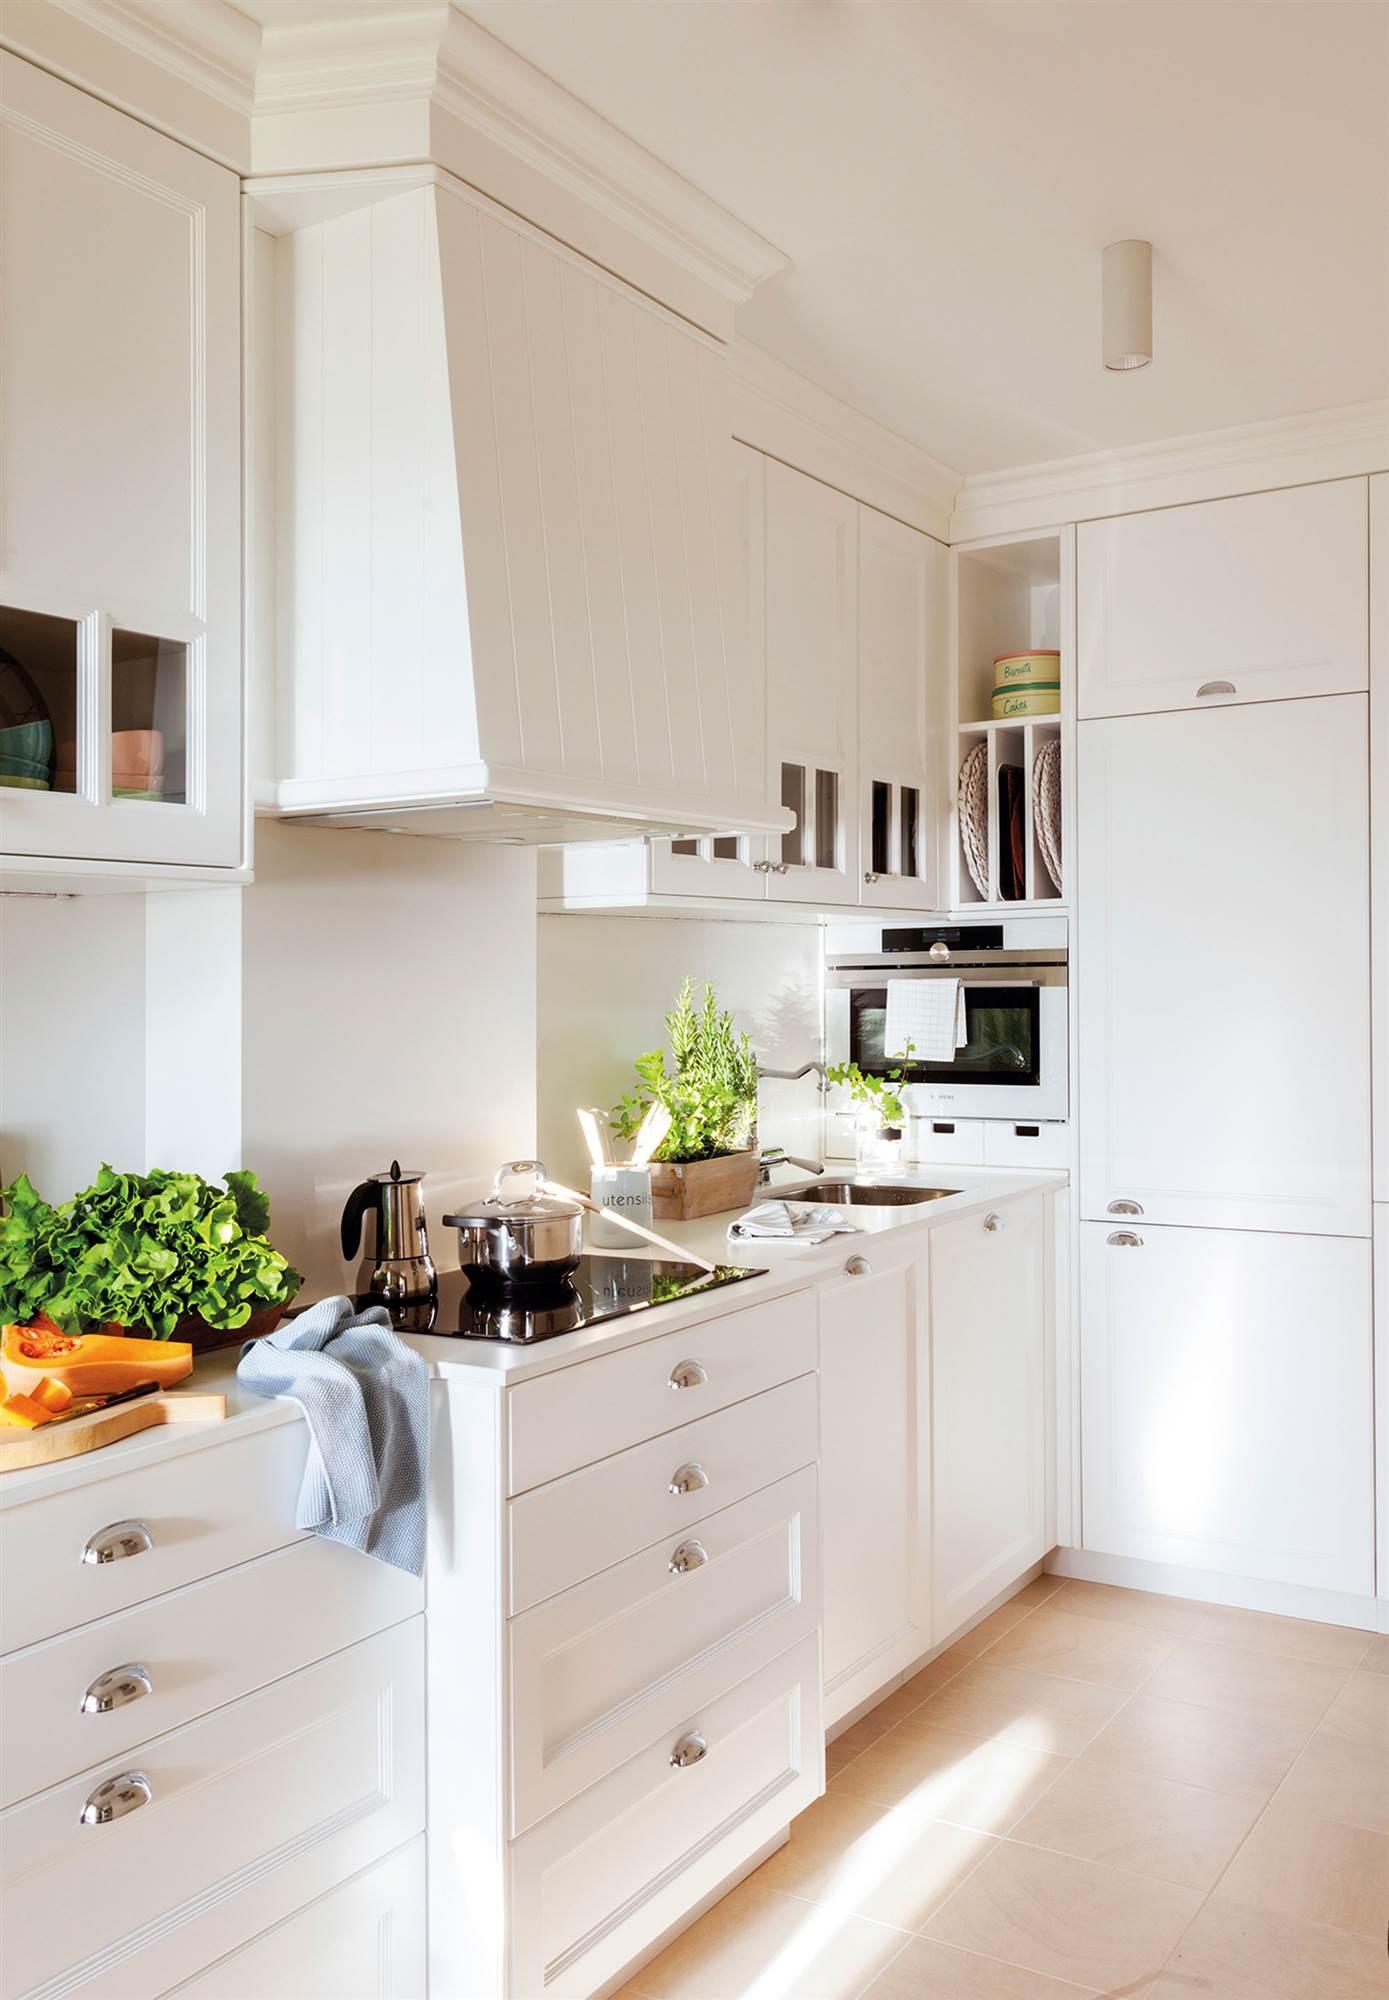 Cocinas peque as ideas decorativas para aprovecharlas y for Ideas para cocinas pequenas rusticas